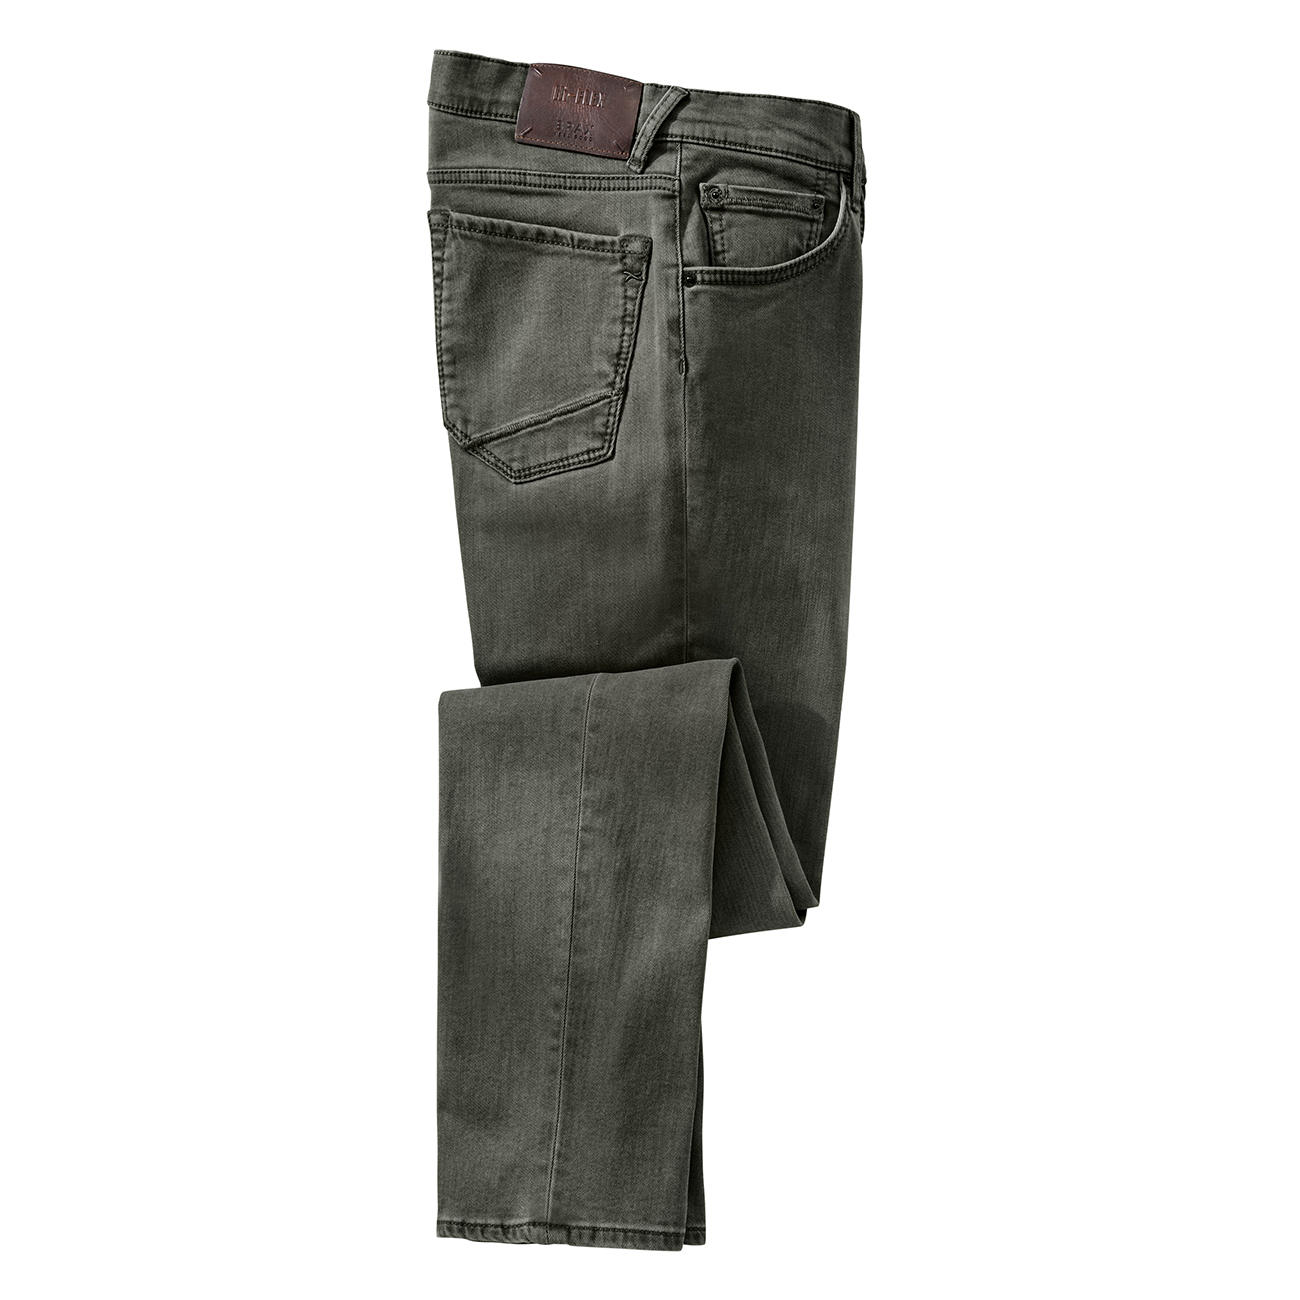 New York begrenzter Preis neue sorten Brax Coloured-Denim-Jeans Hi-Flex | Klassiker entdecken